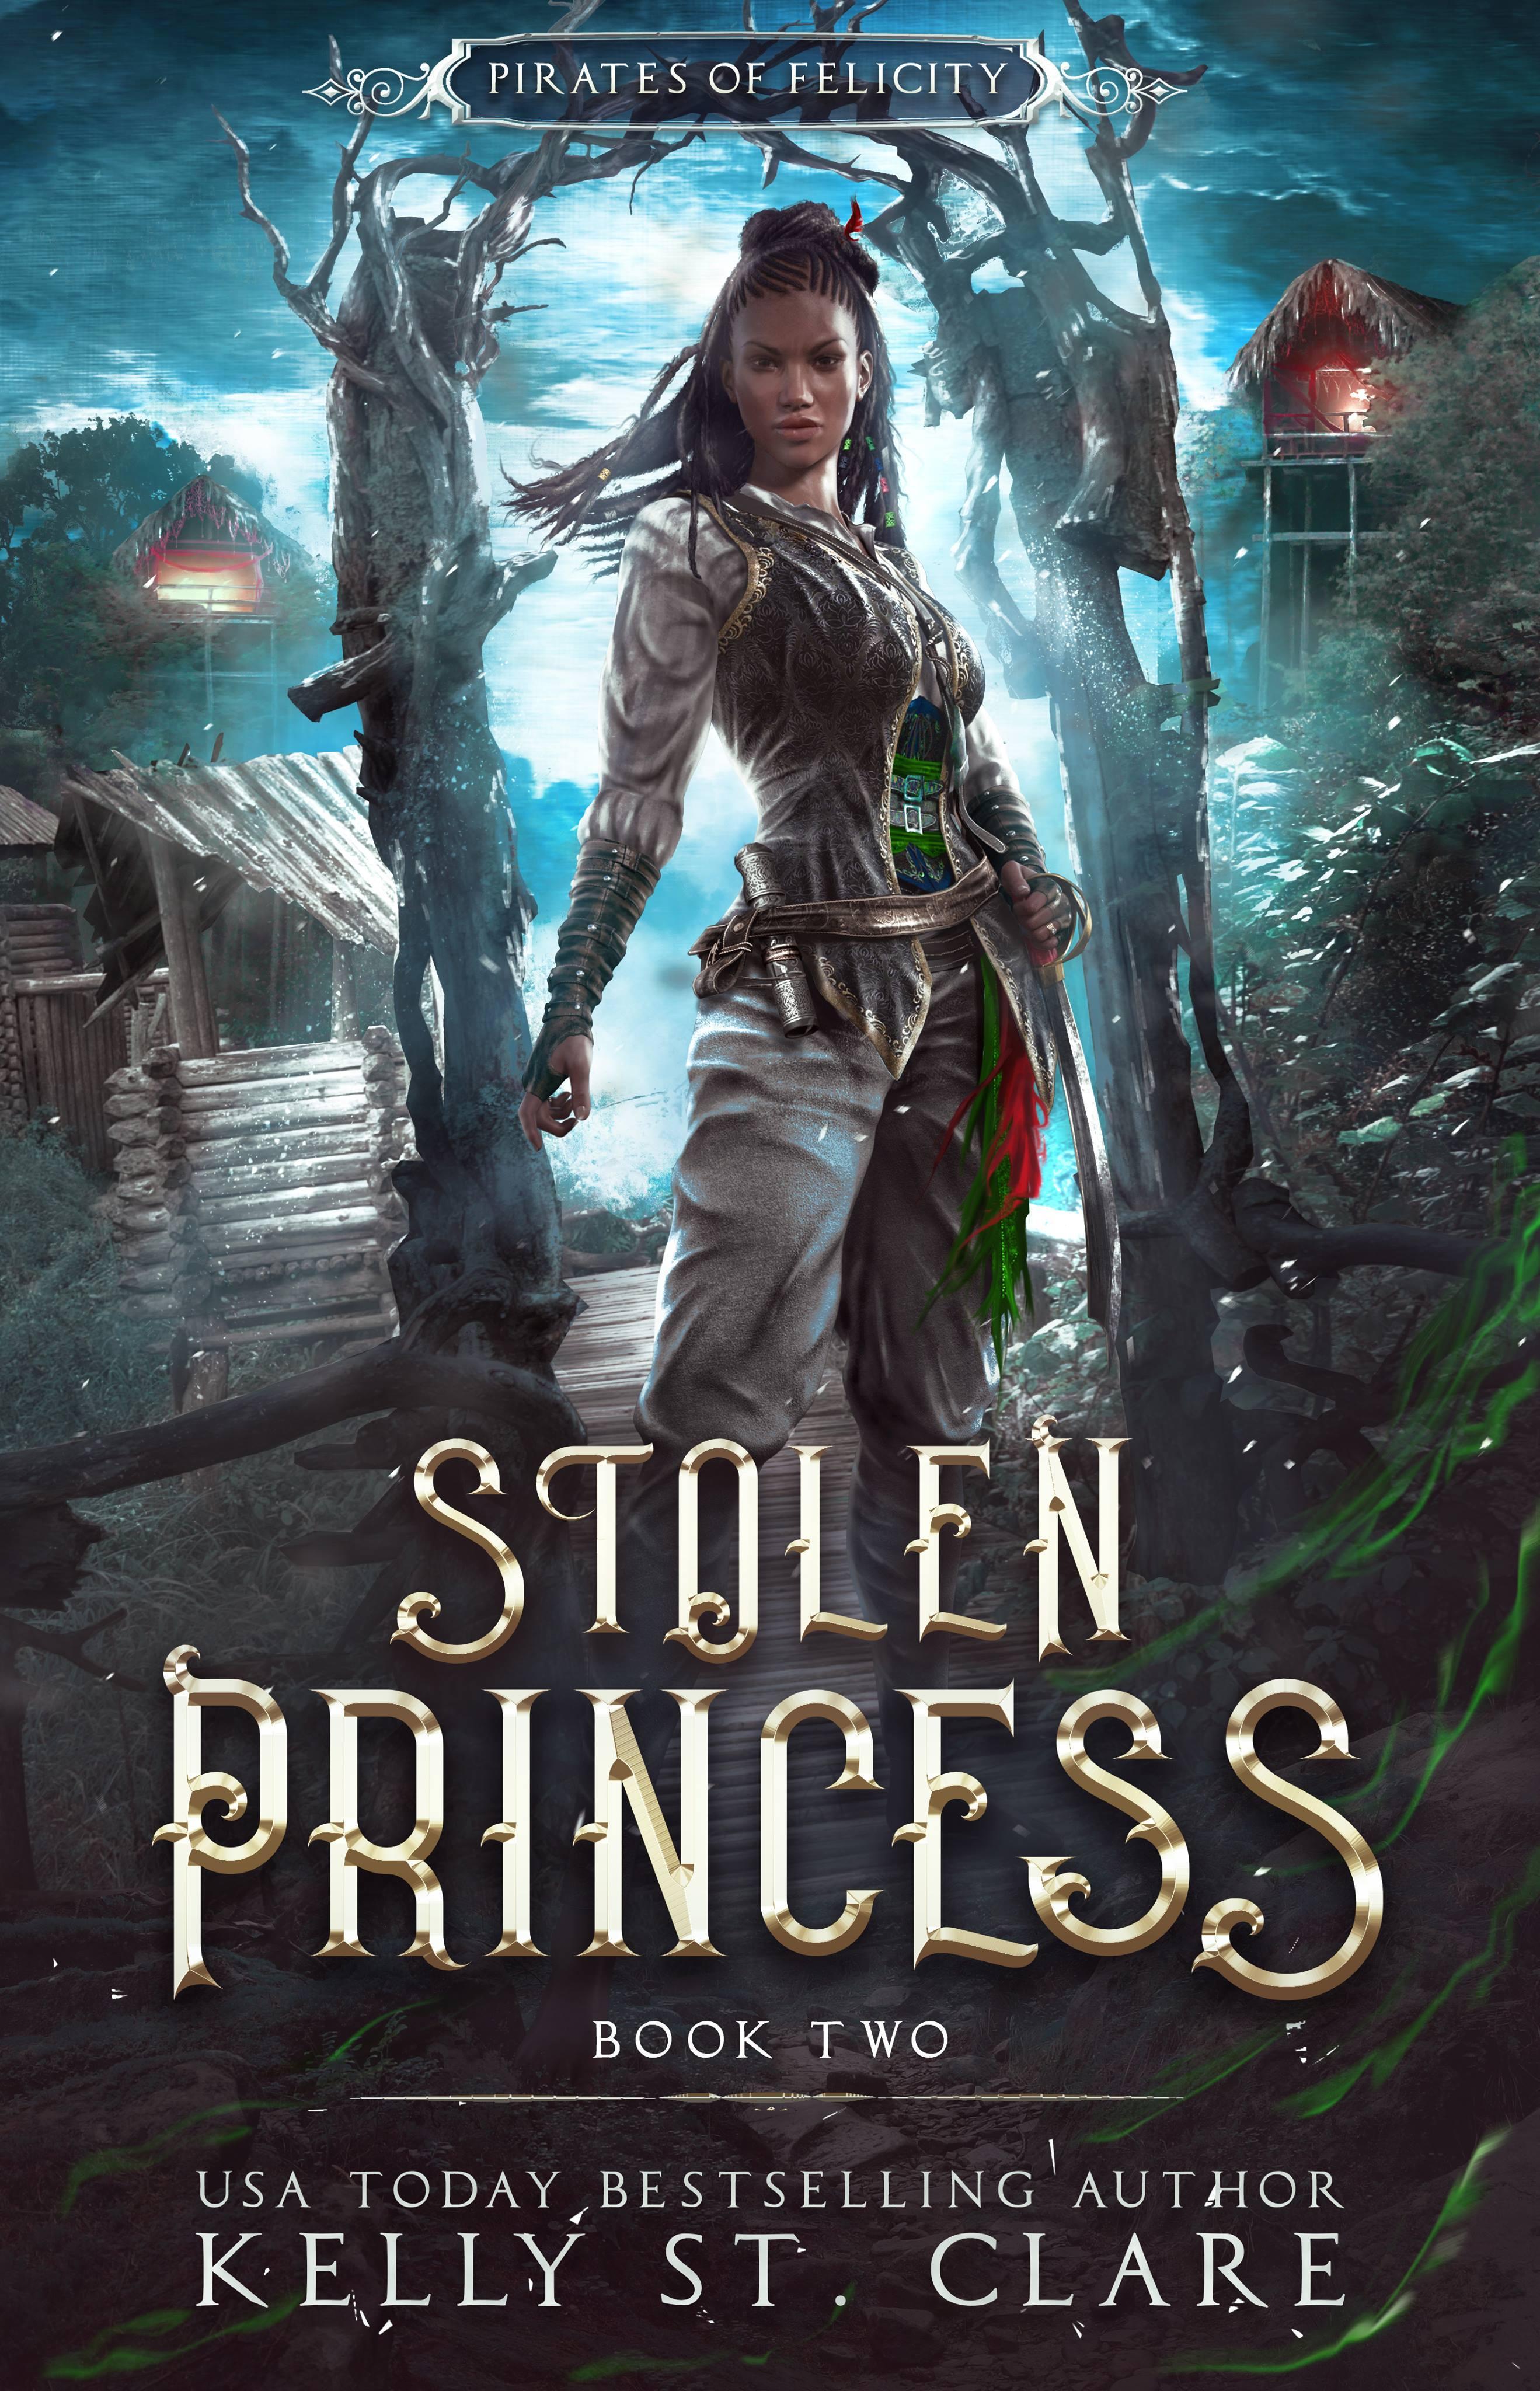 Kelly St. Clare - Pirates of Felicity 2 - Ebba-Viva Fairisles Stolen Princess